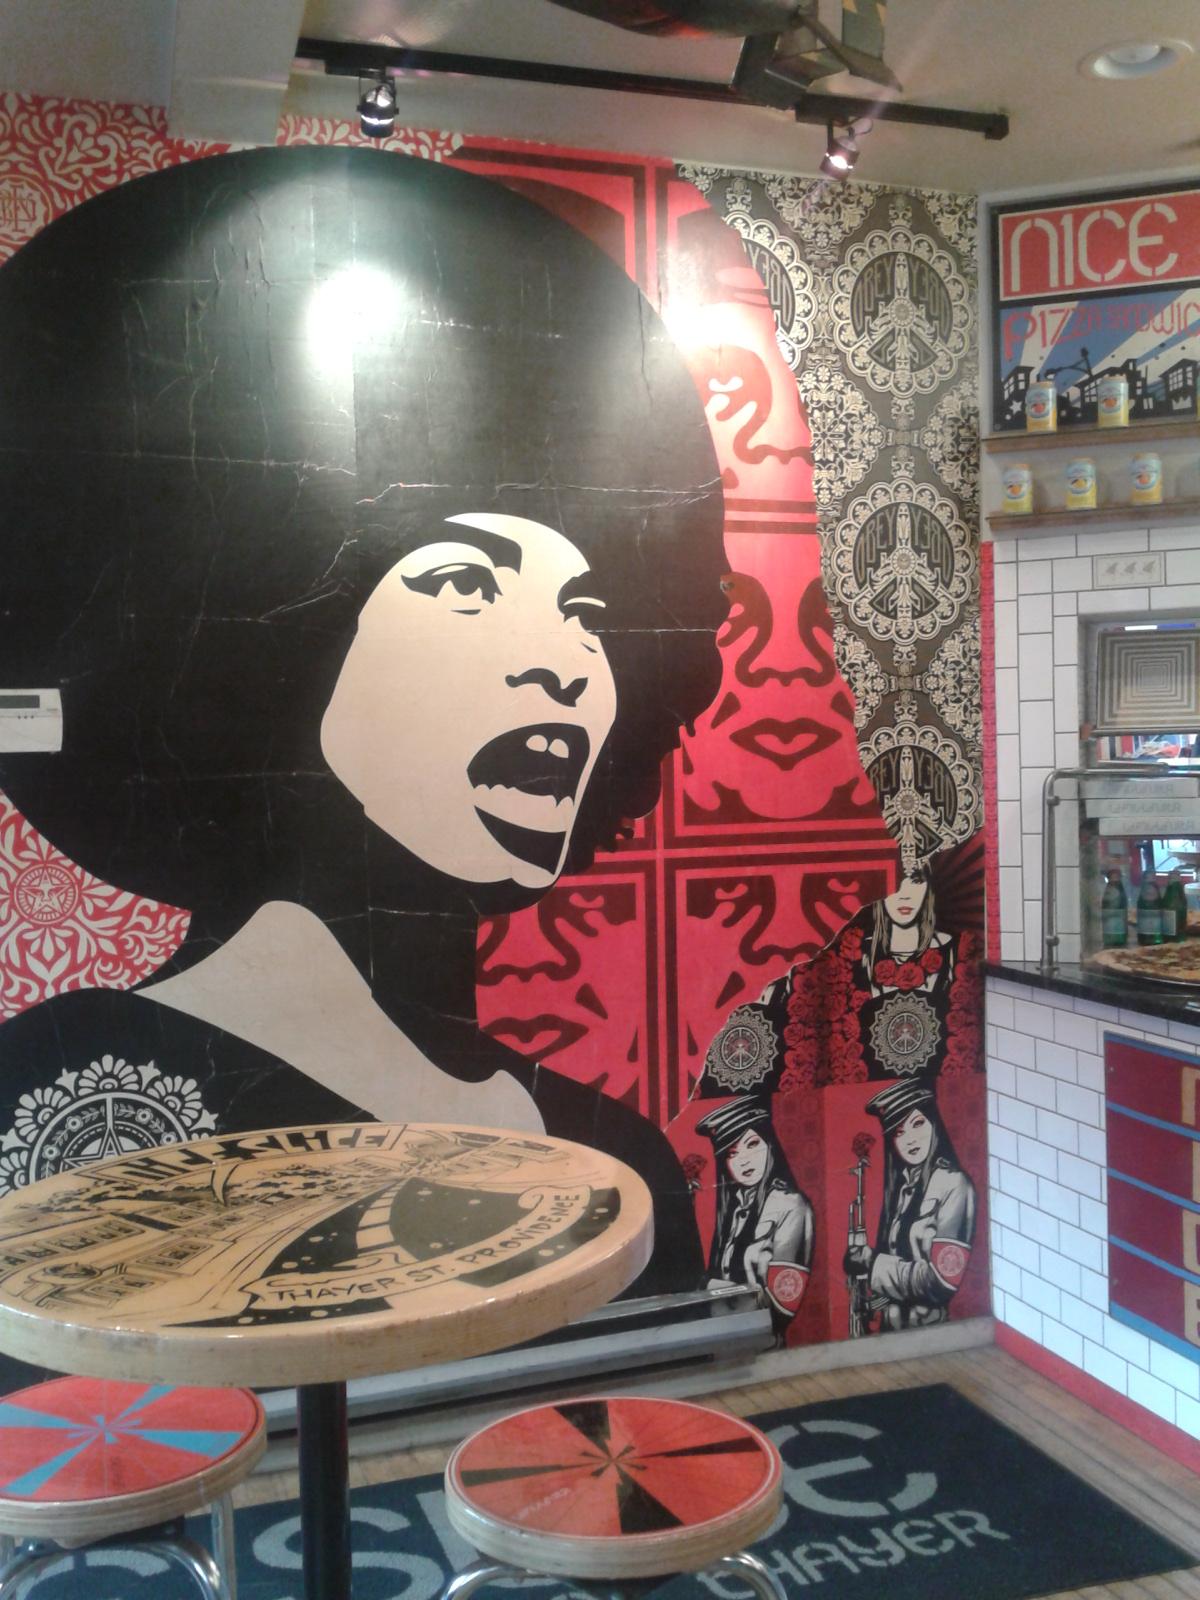 Design at the Nice Slice